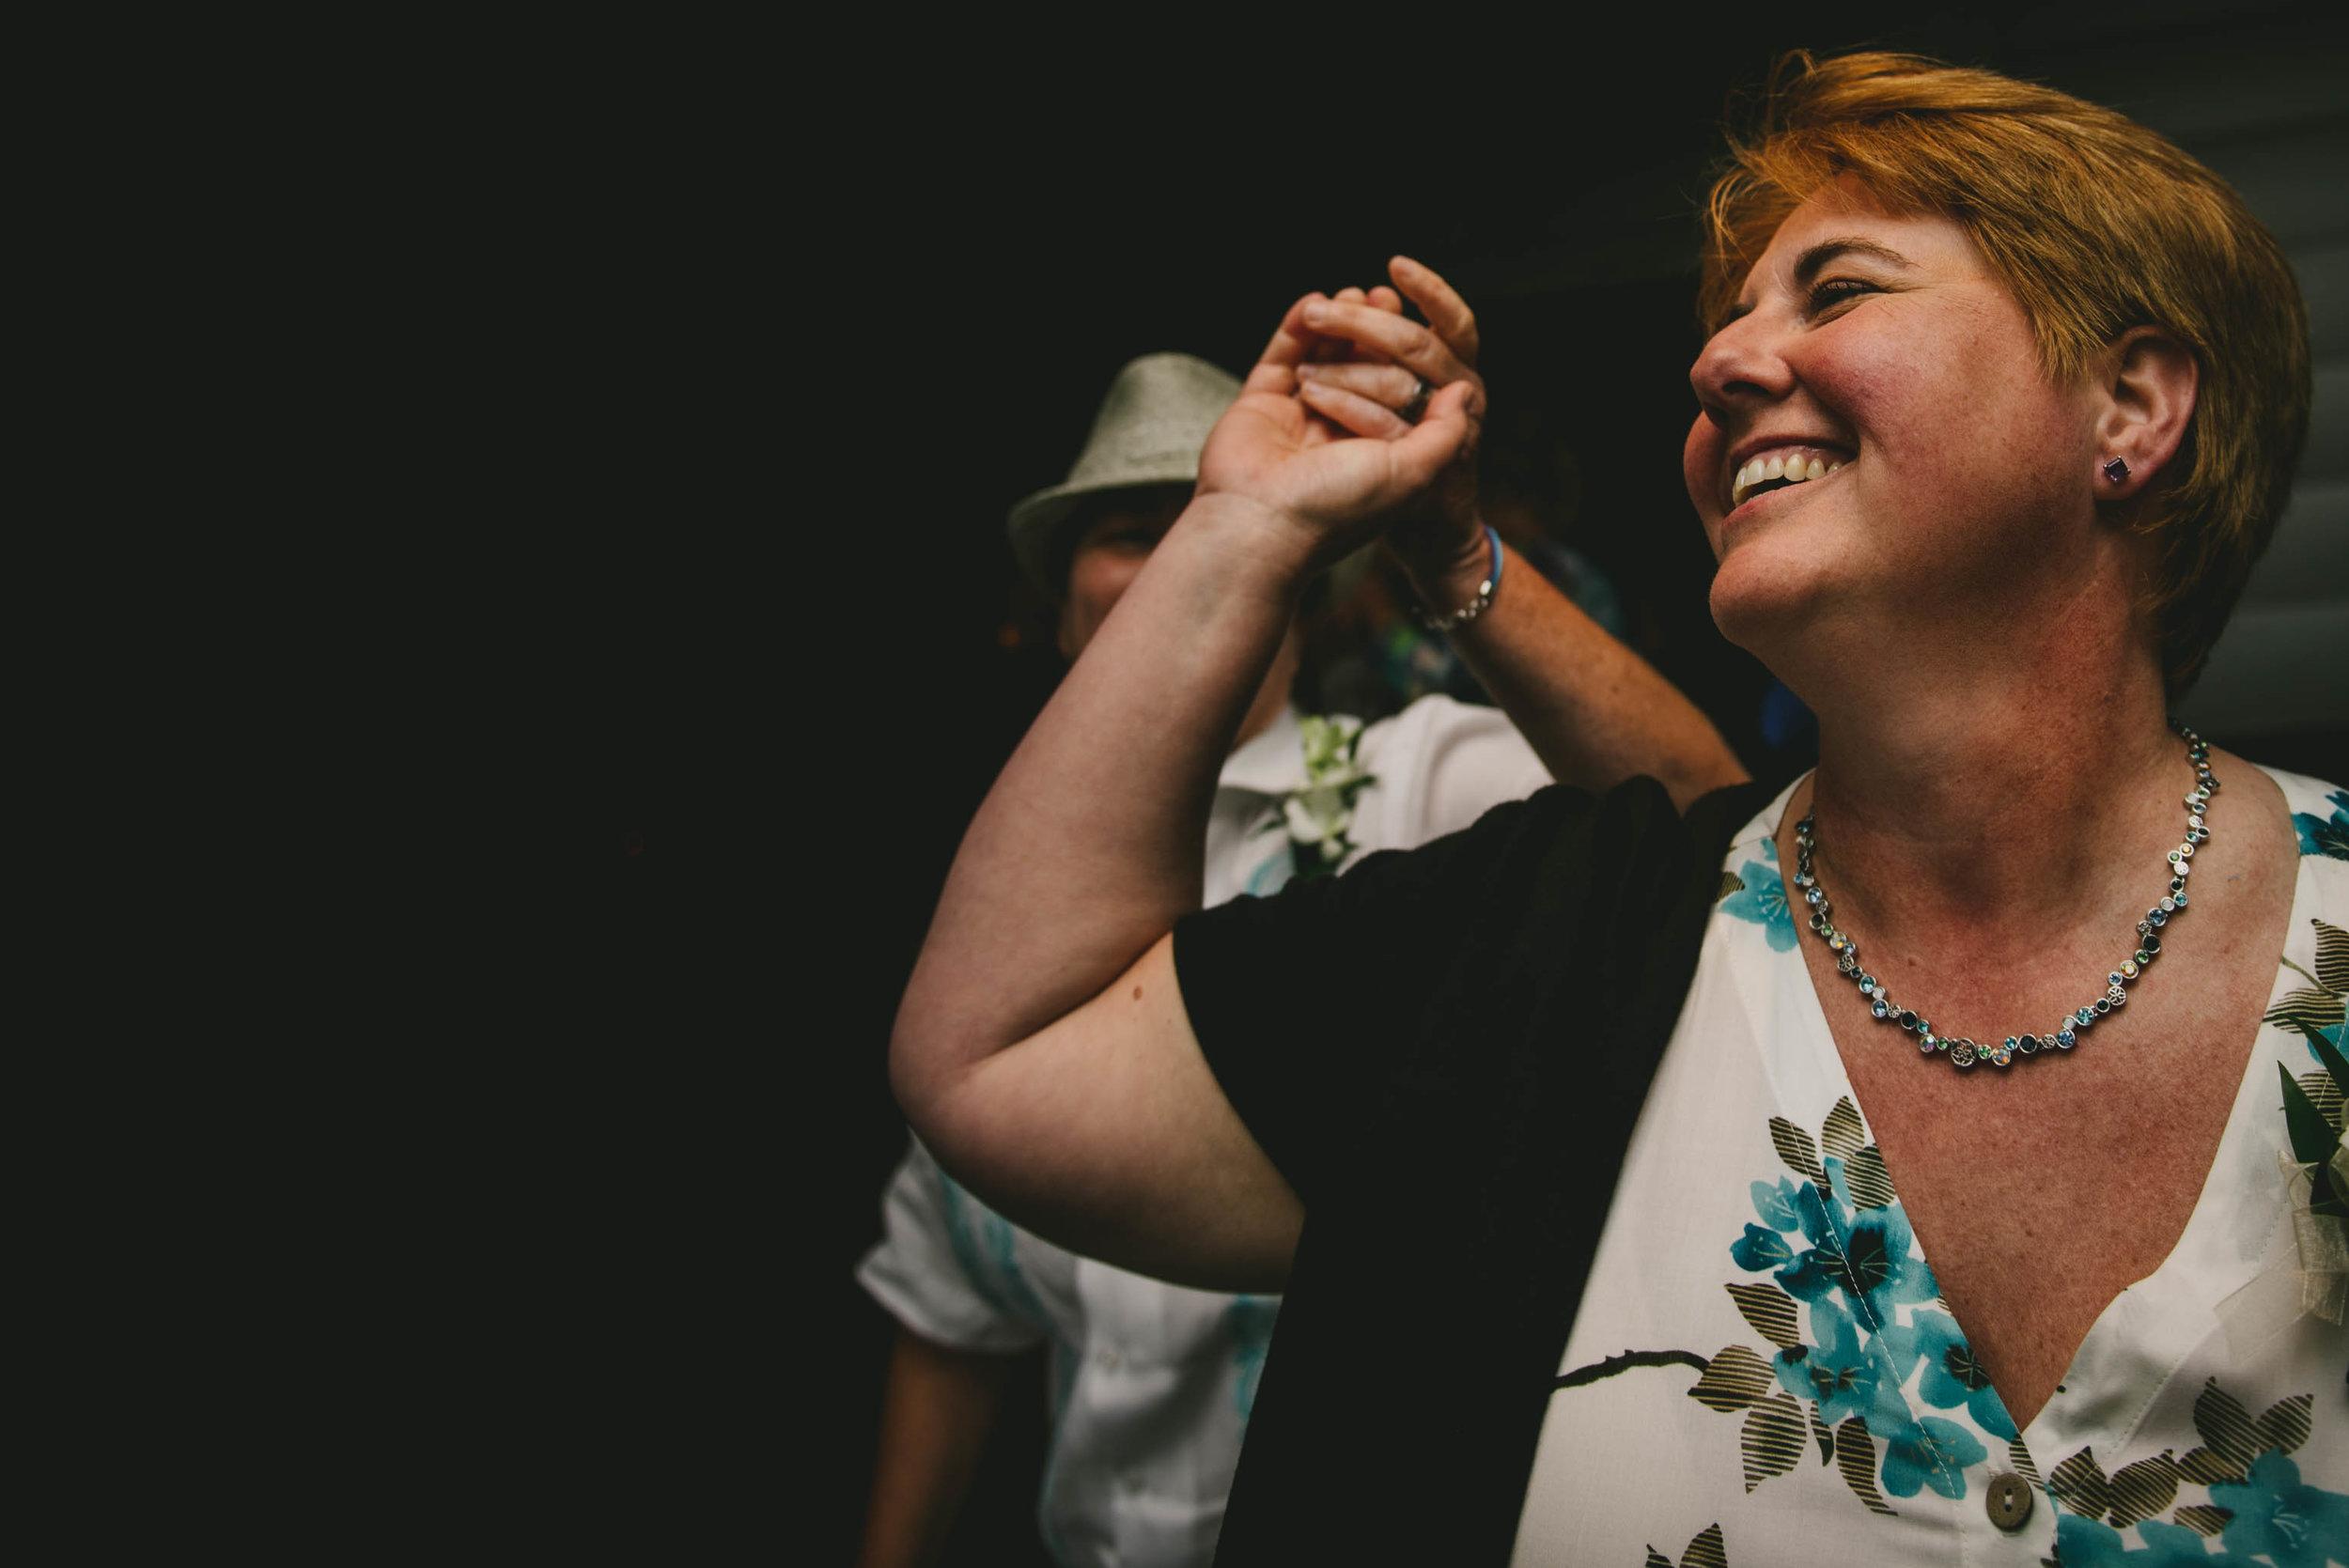 solas-restaurant-raleigh-same-sex-wedding-reception-dancing-photo.jpg